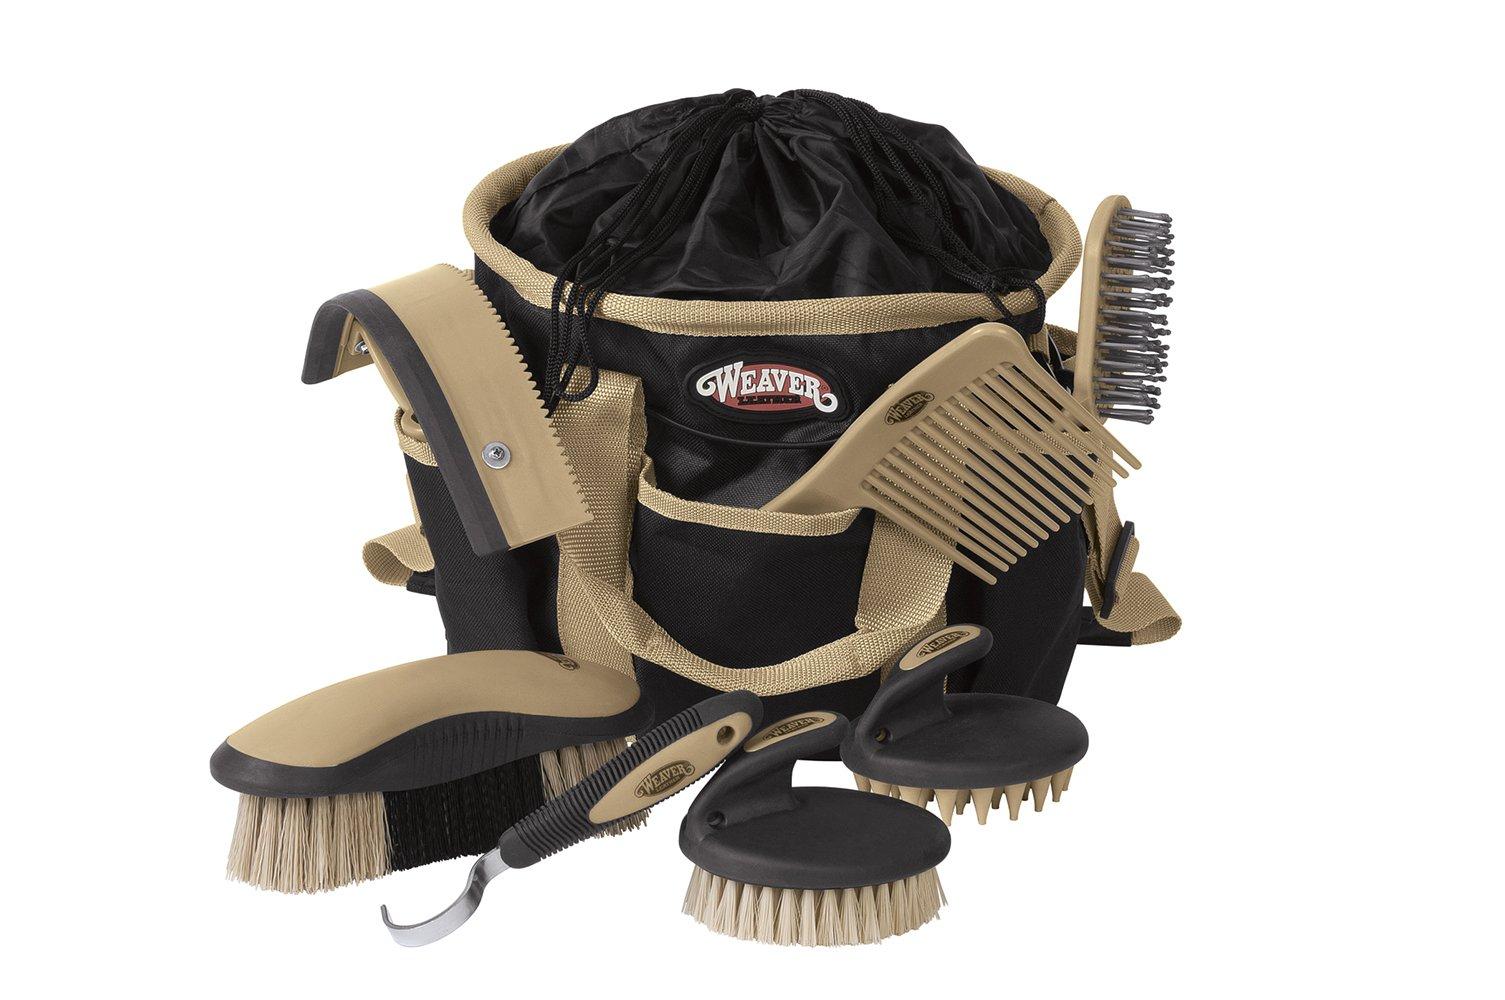 Weaver Leather Grooming Kit, Black/Beige by Weaver Leather